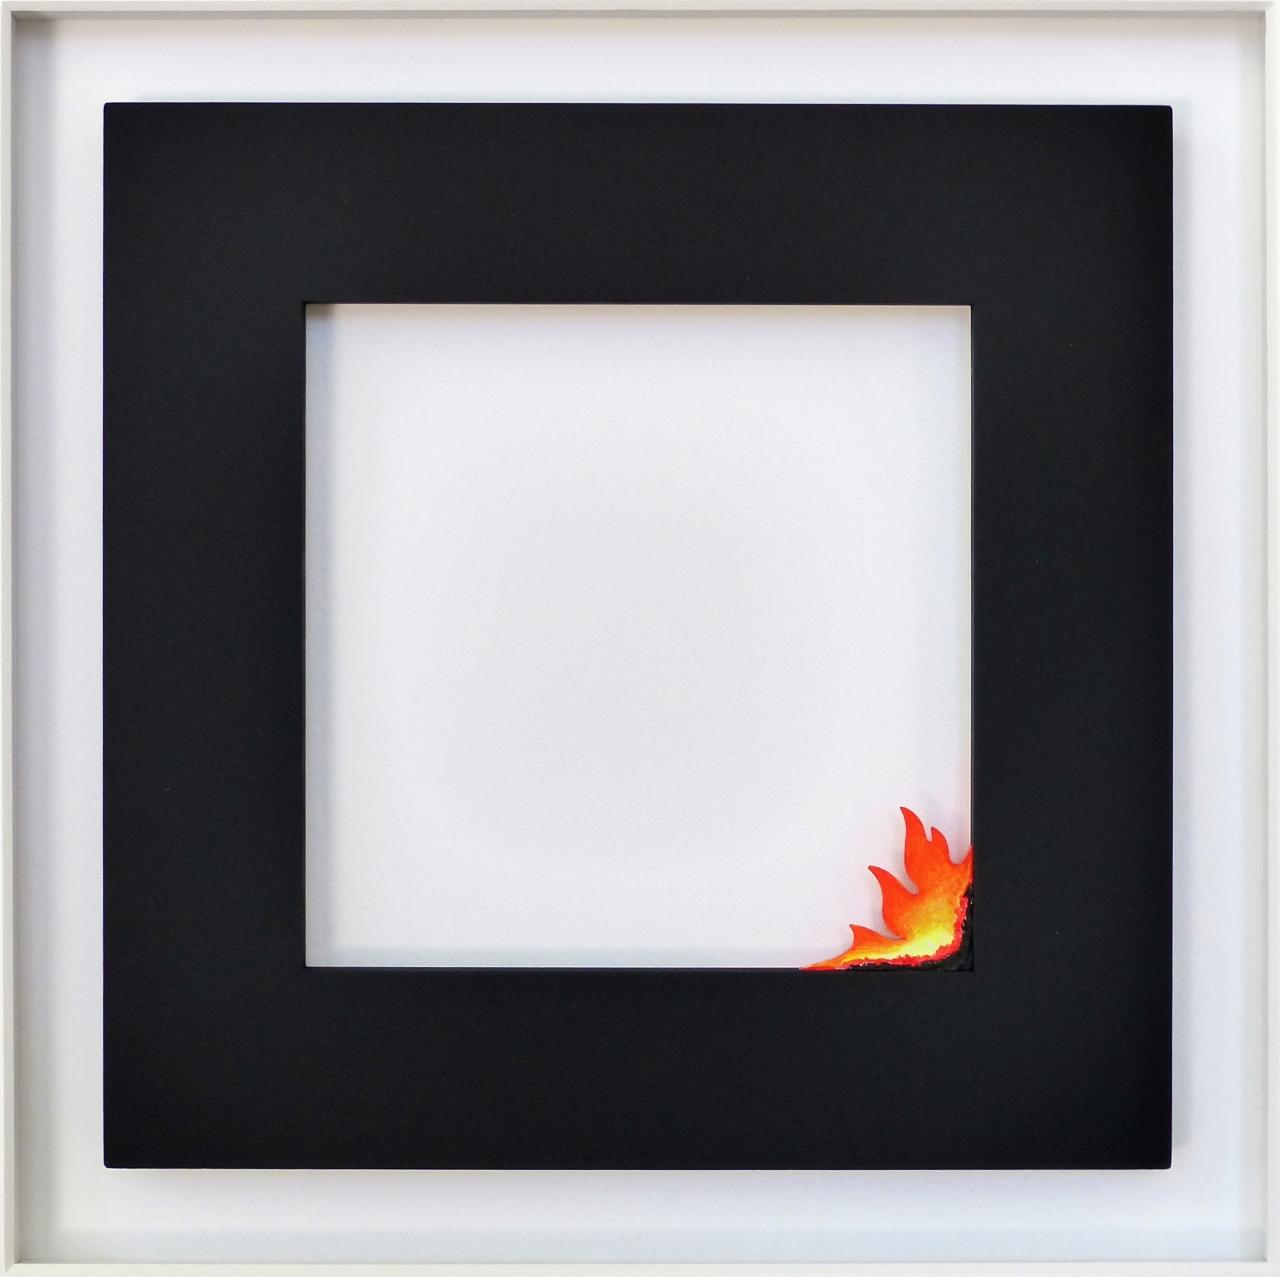 Feuer im Rahmen